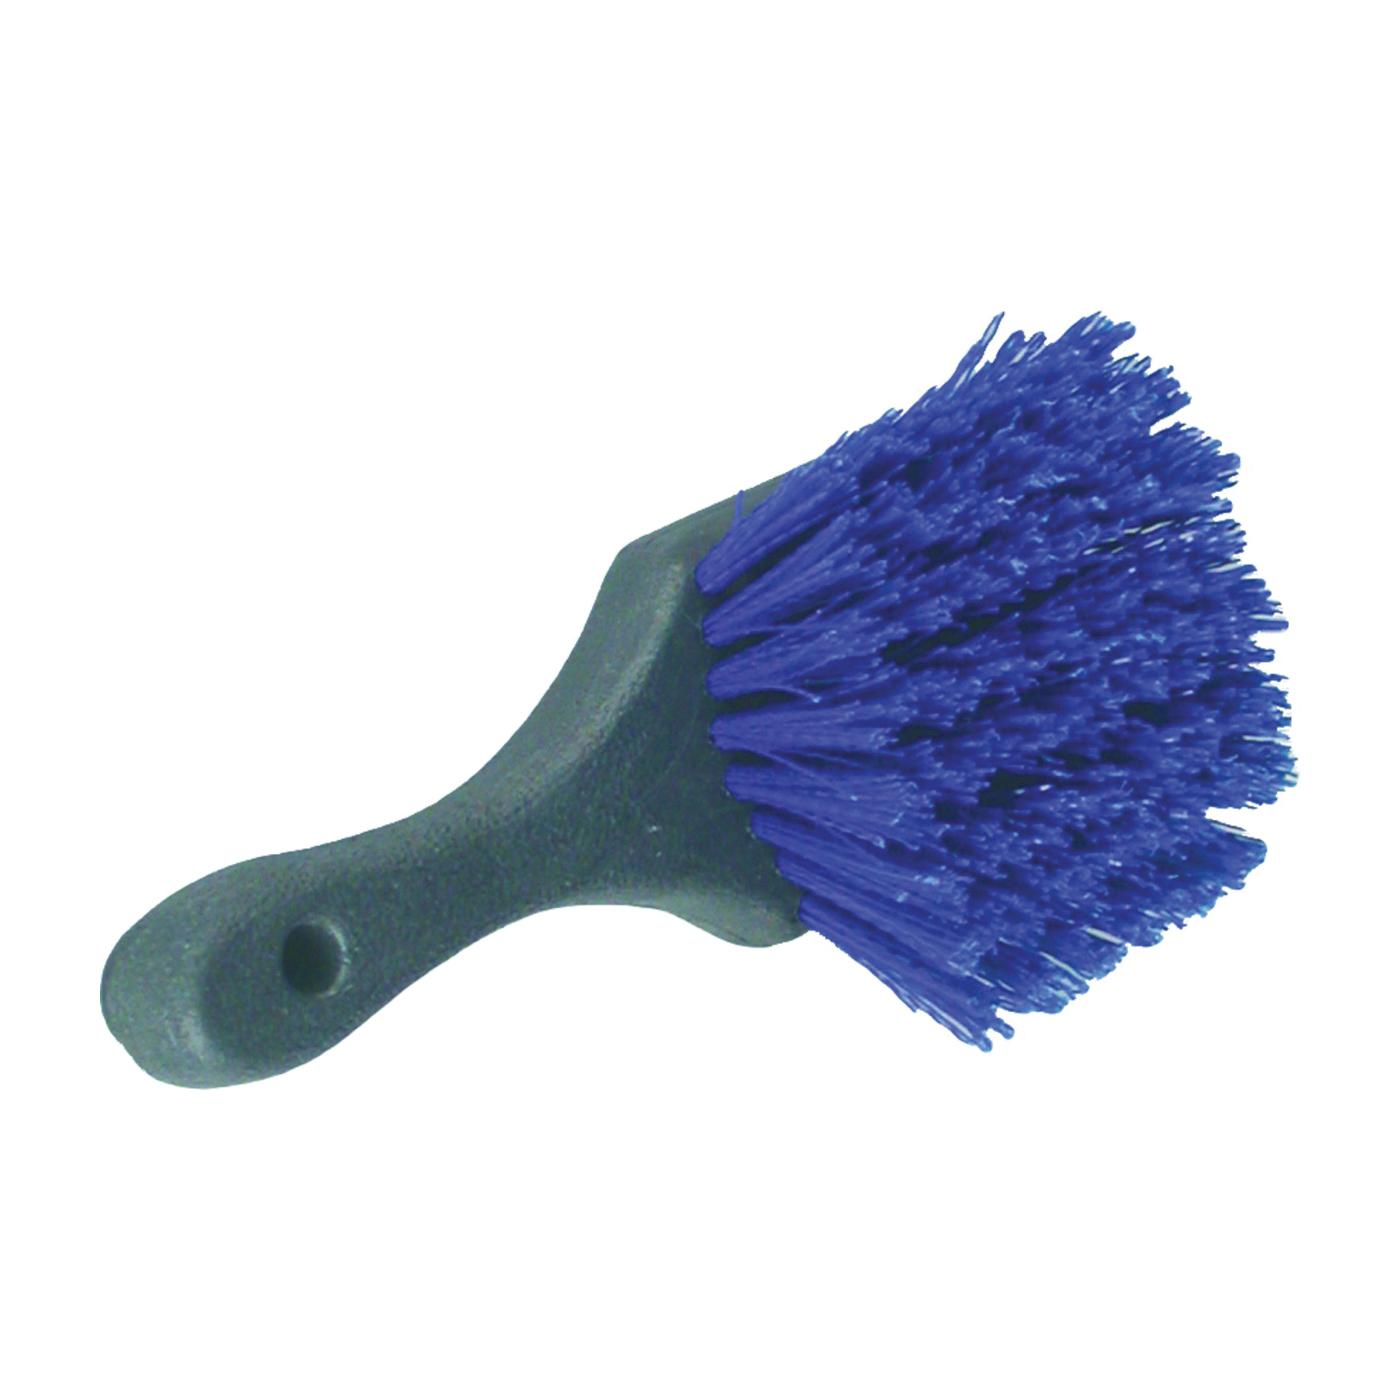 Picture of BIRDWELL 465-24 Utility Brush, 2 in L Trim